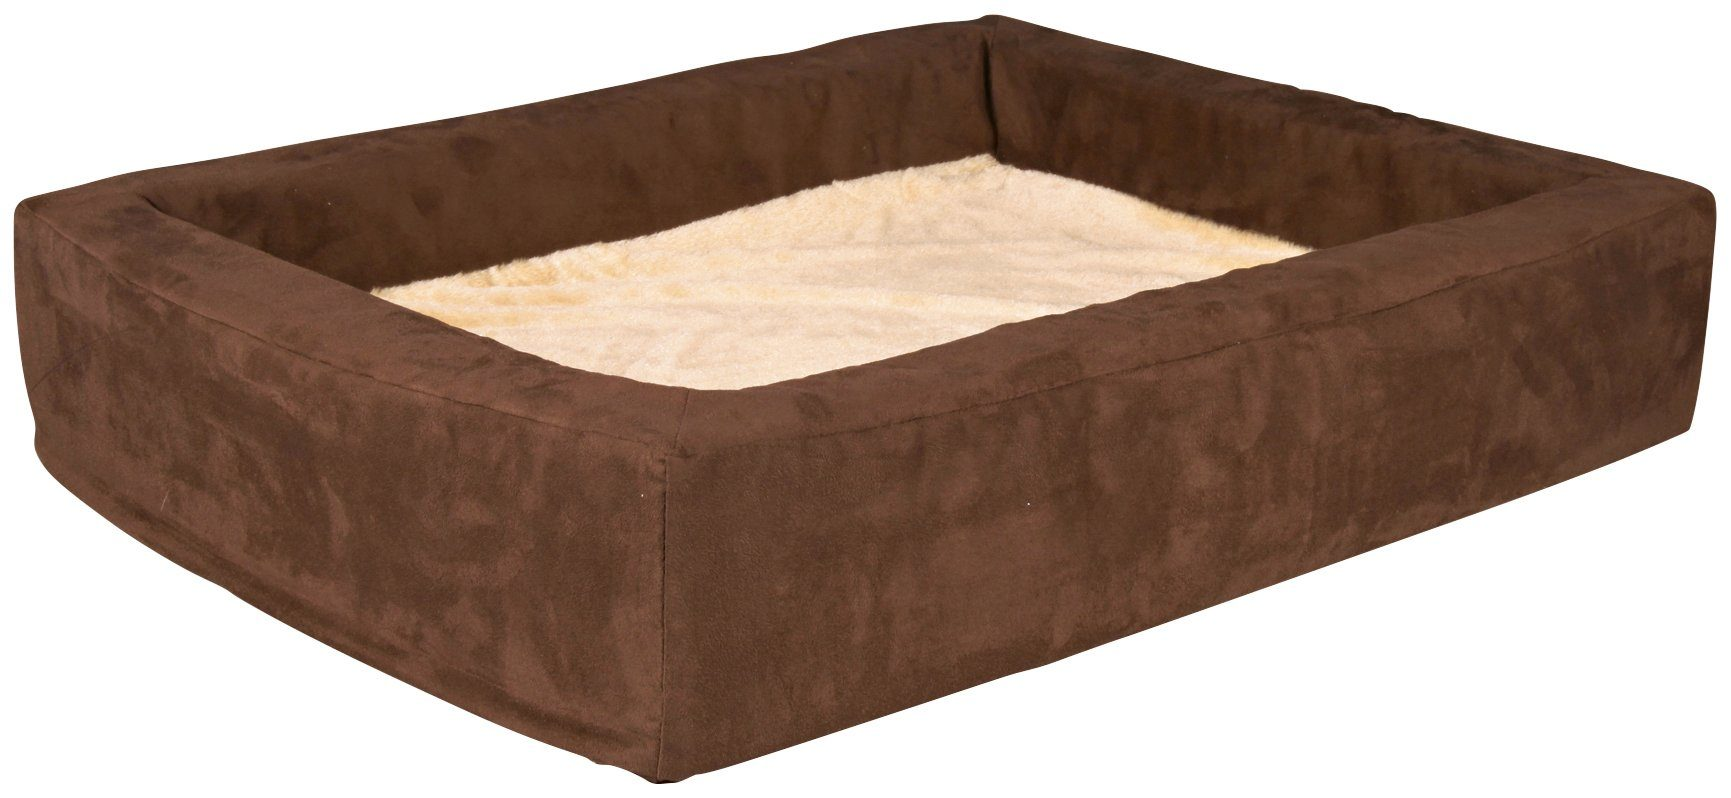 Hunde-Bett »Vital Bett Memory«, BxL: 85x68 cm, braun/beige